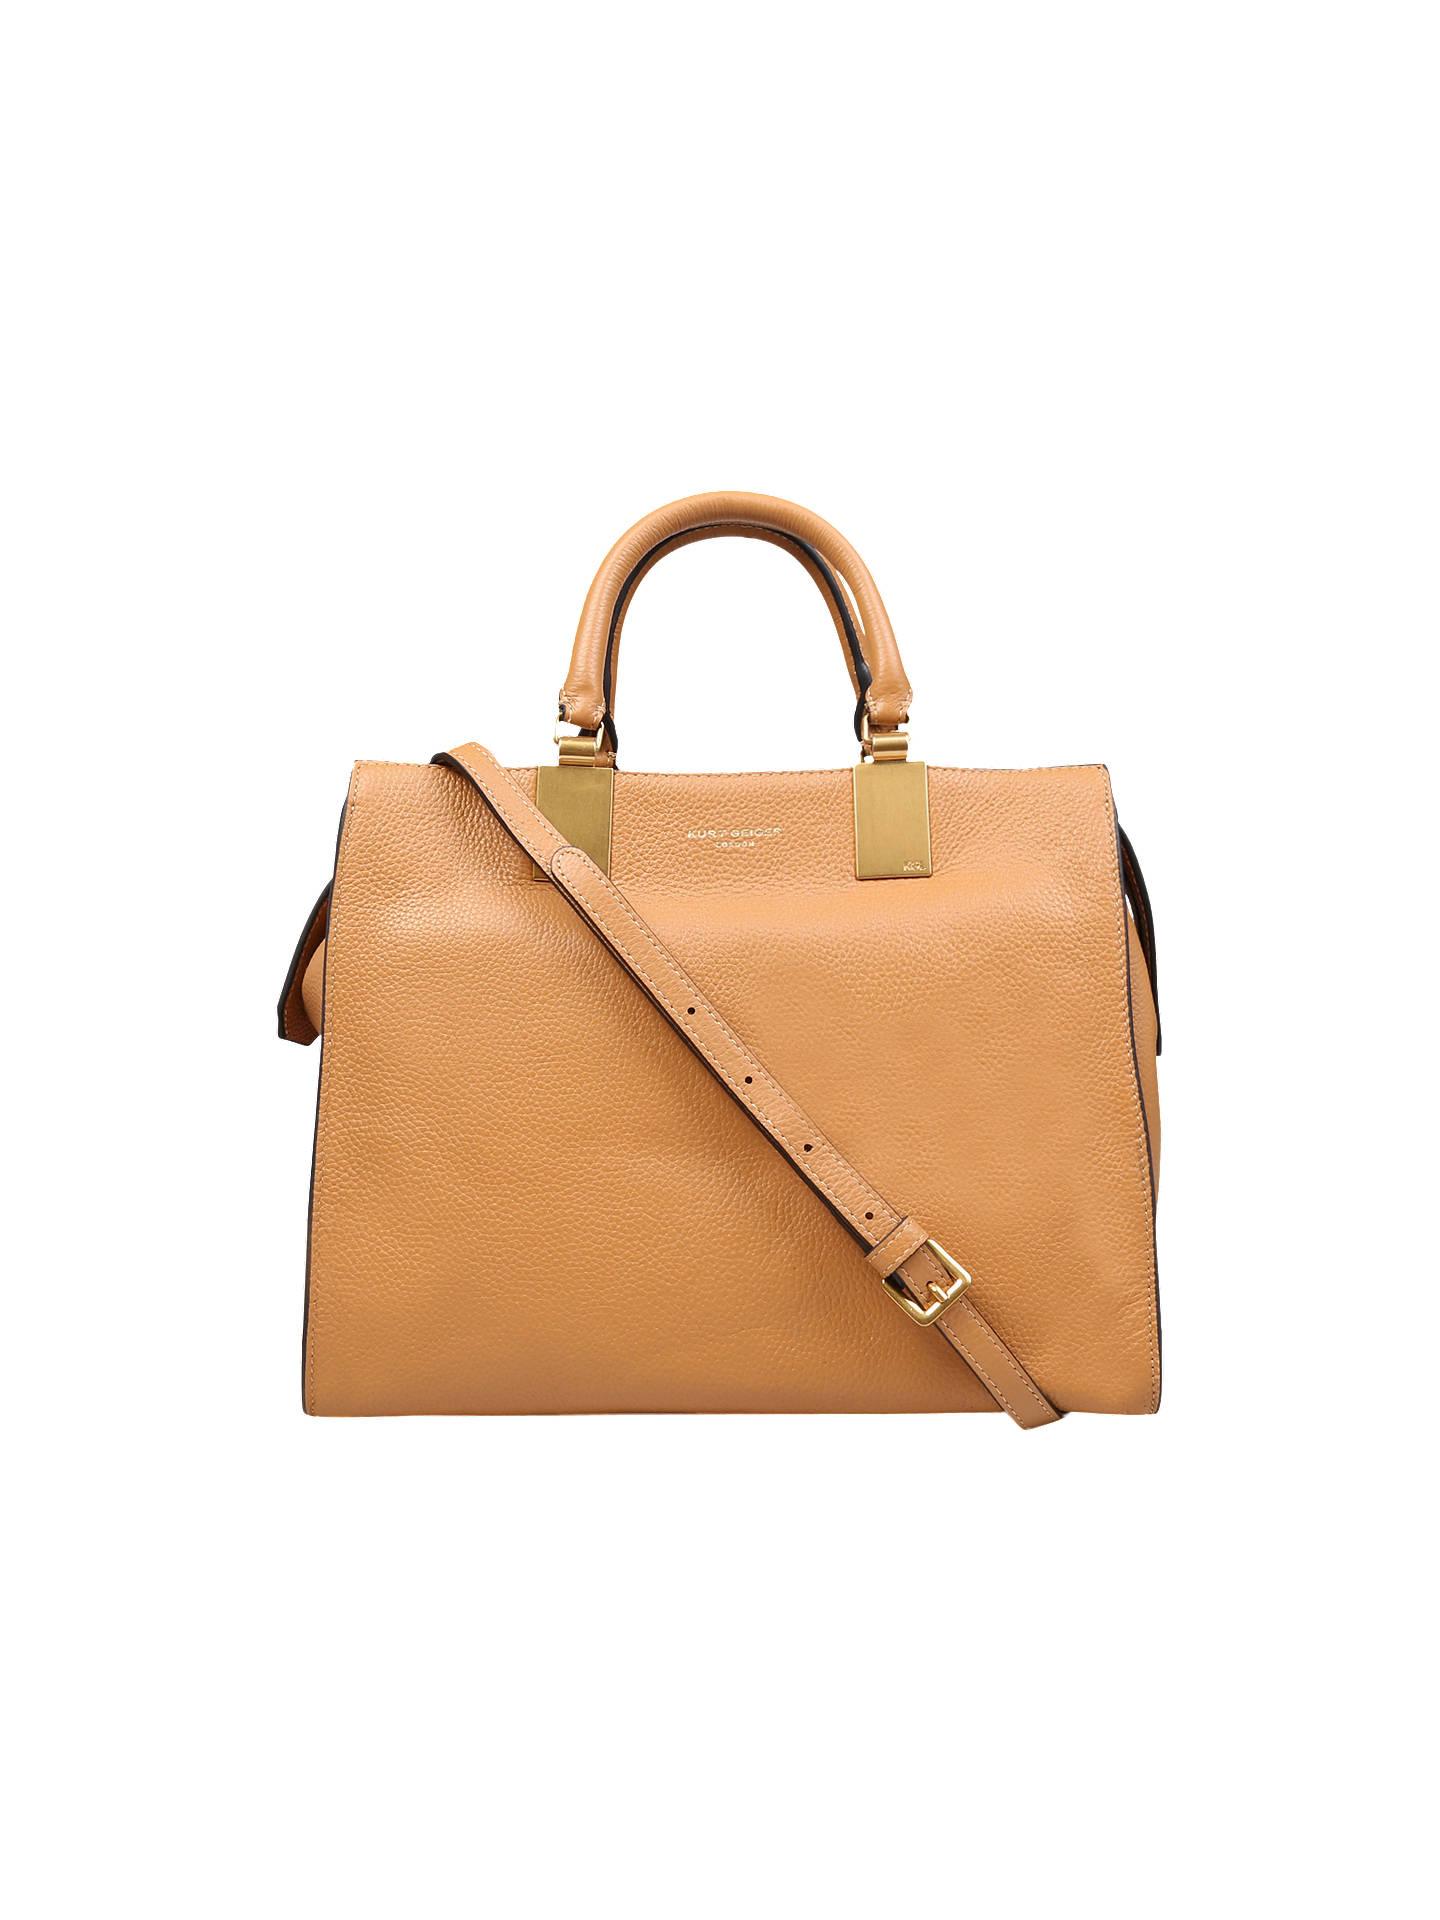 dd73ac78d3c0 Kurt Geiger London Emma Leather Tote Bag, Camel